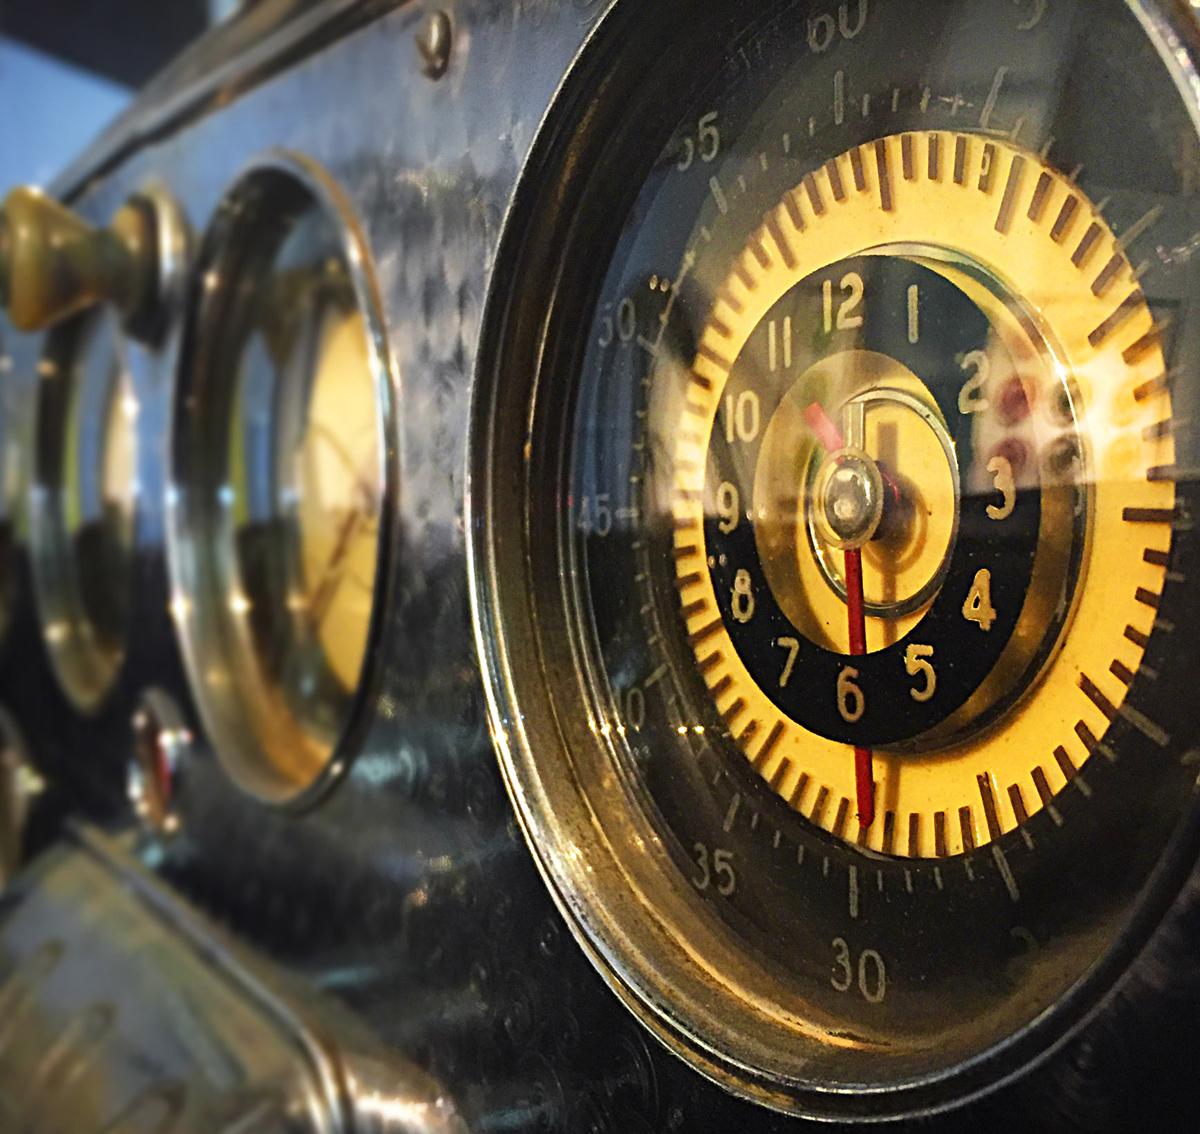 Classic Car Dash Instruments, Malaga Car Museum, Malaga, Photography